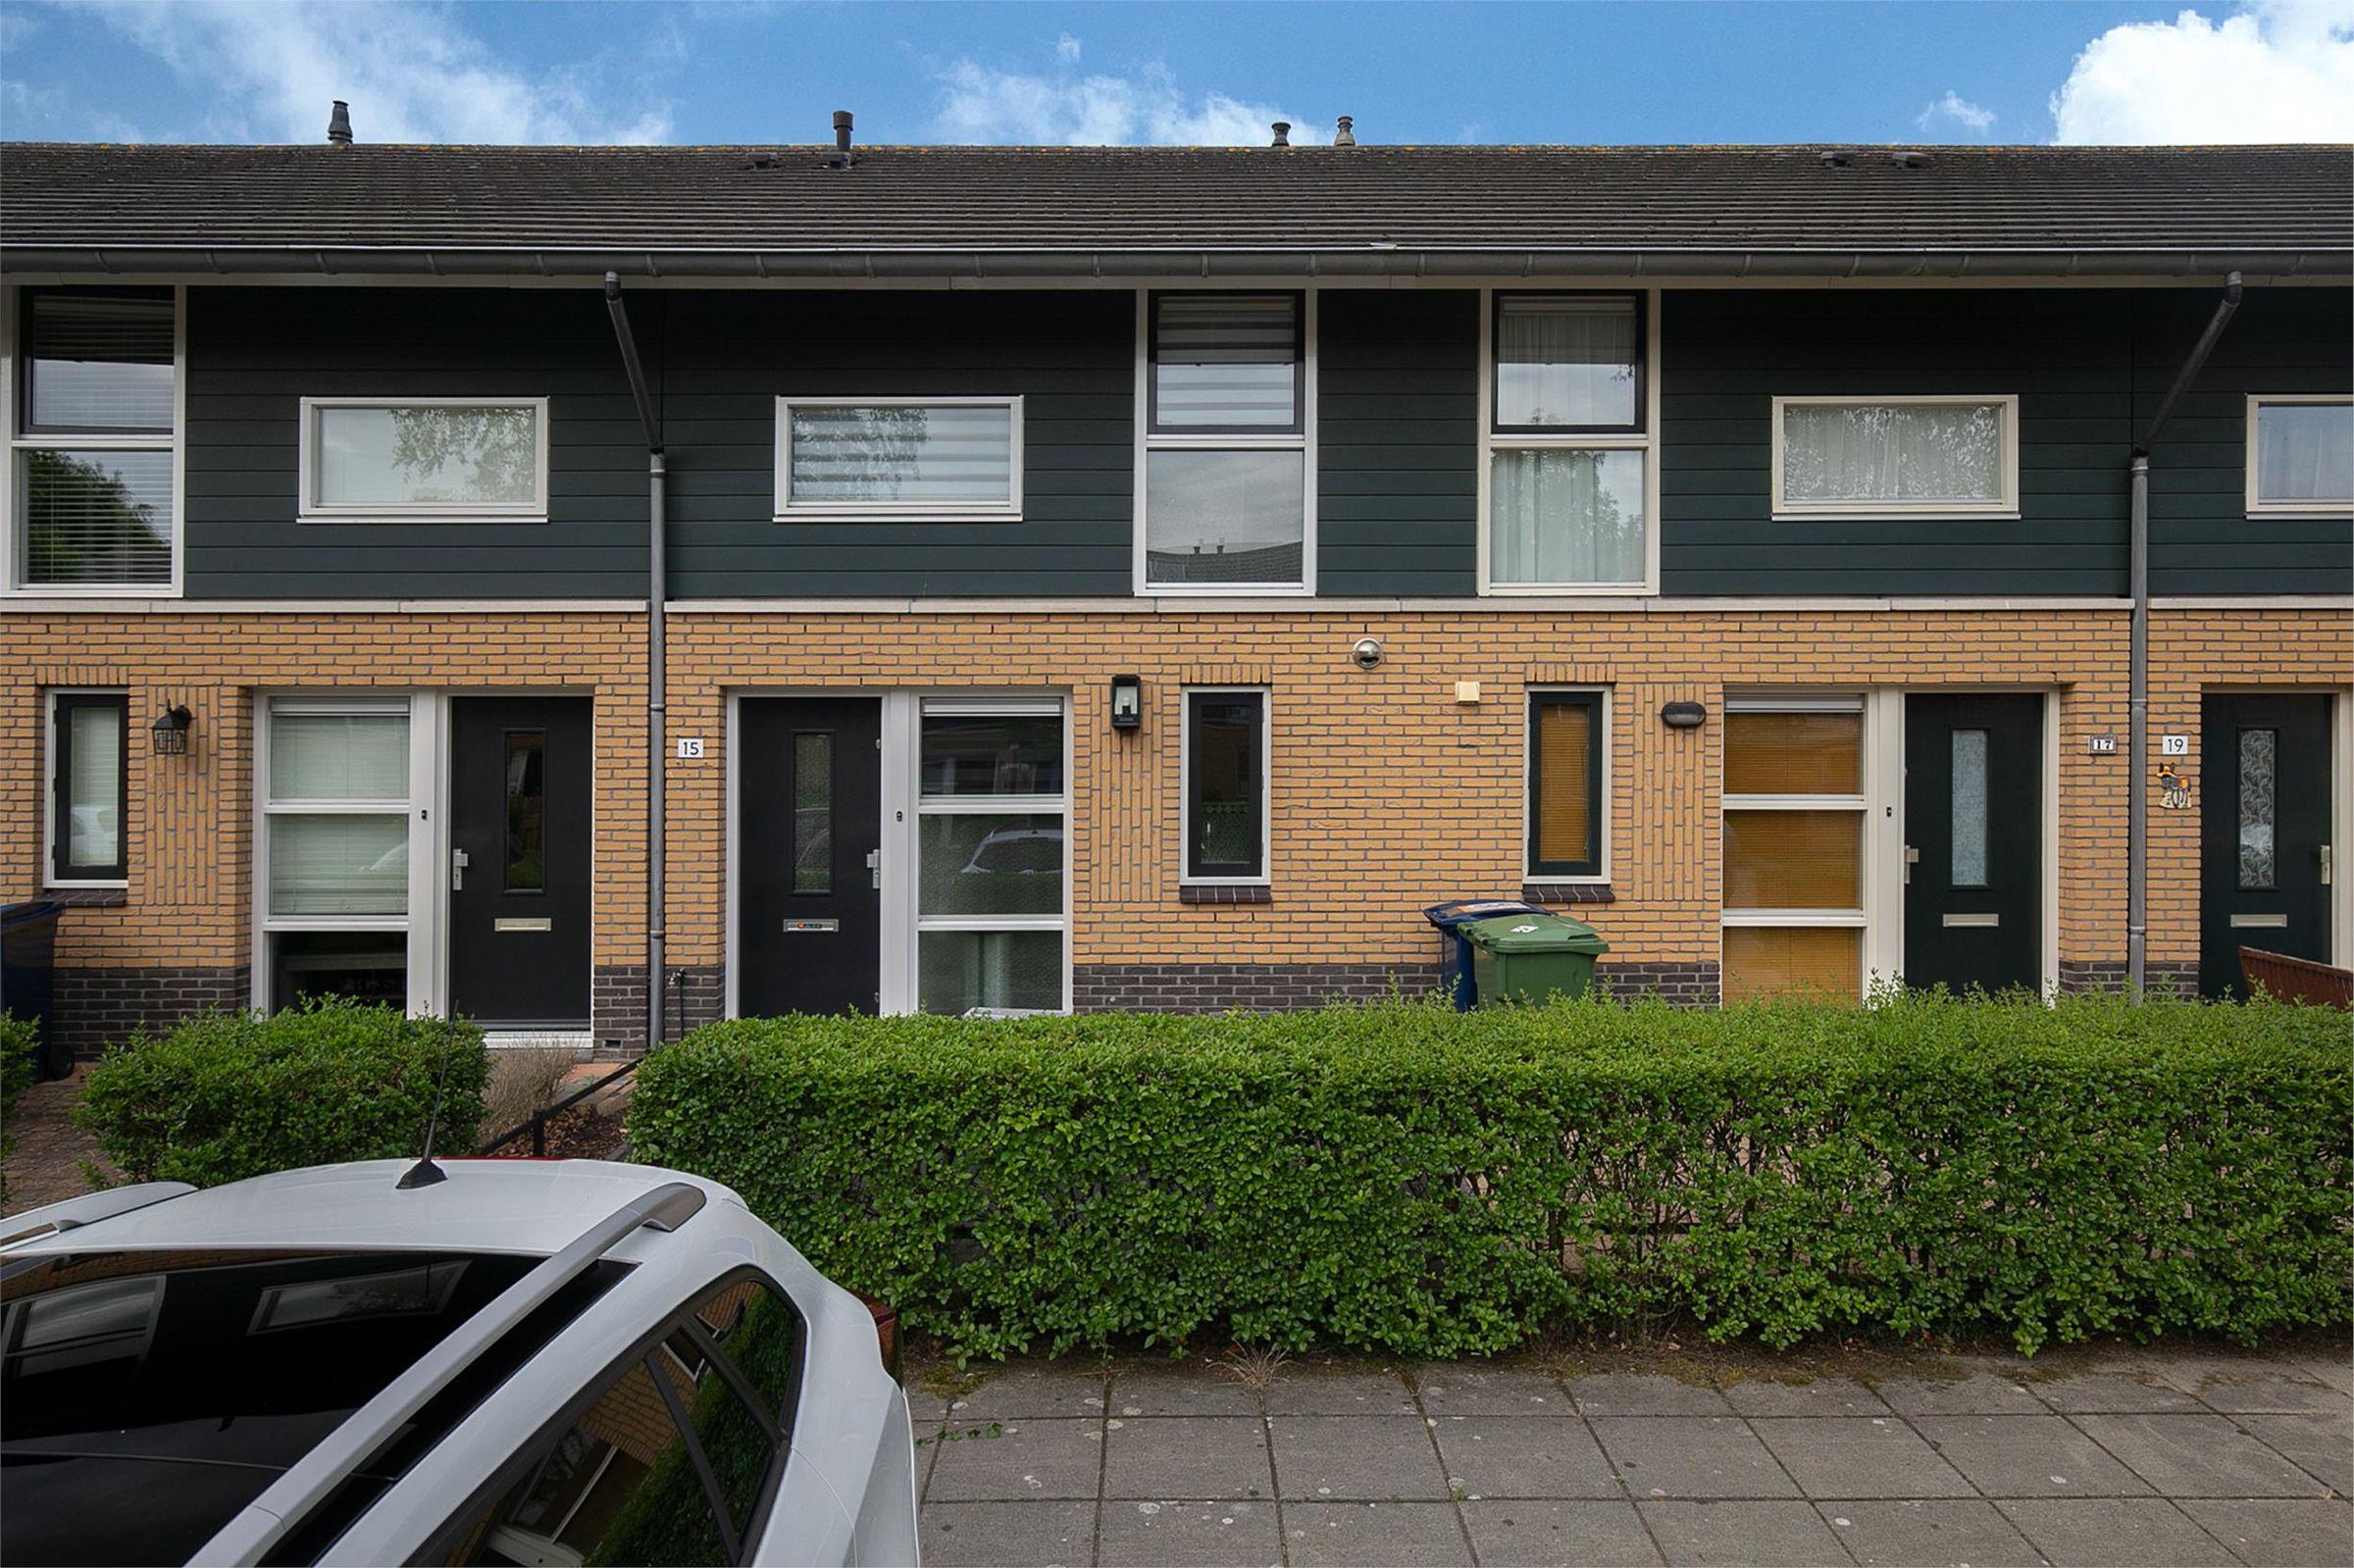 Februaristraat 15, Almere